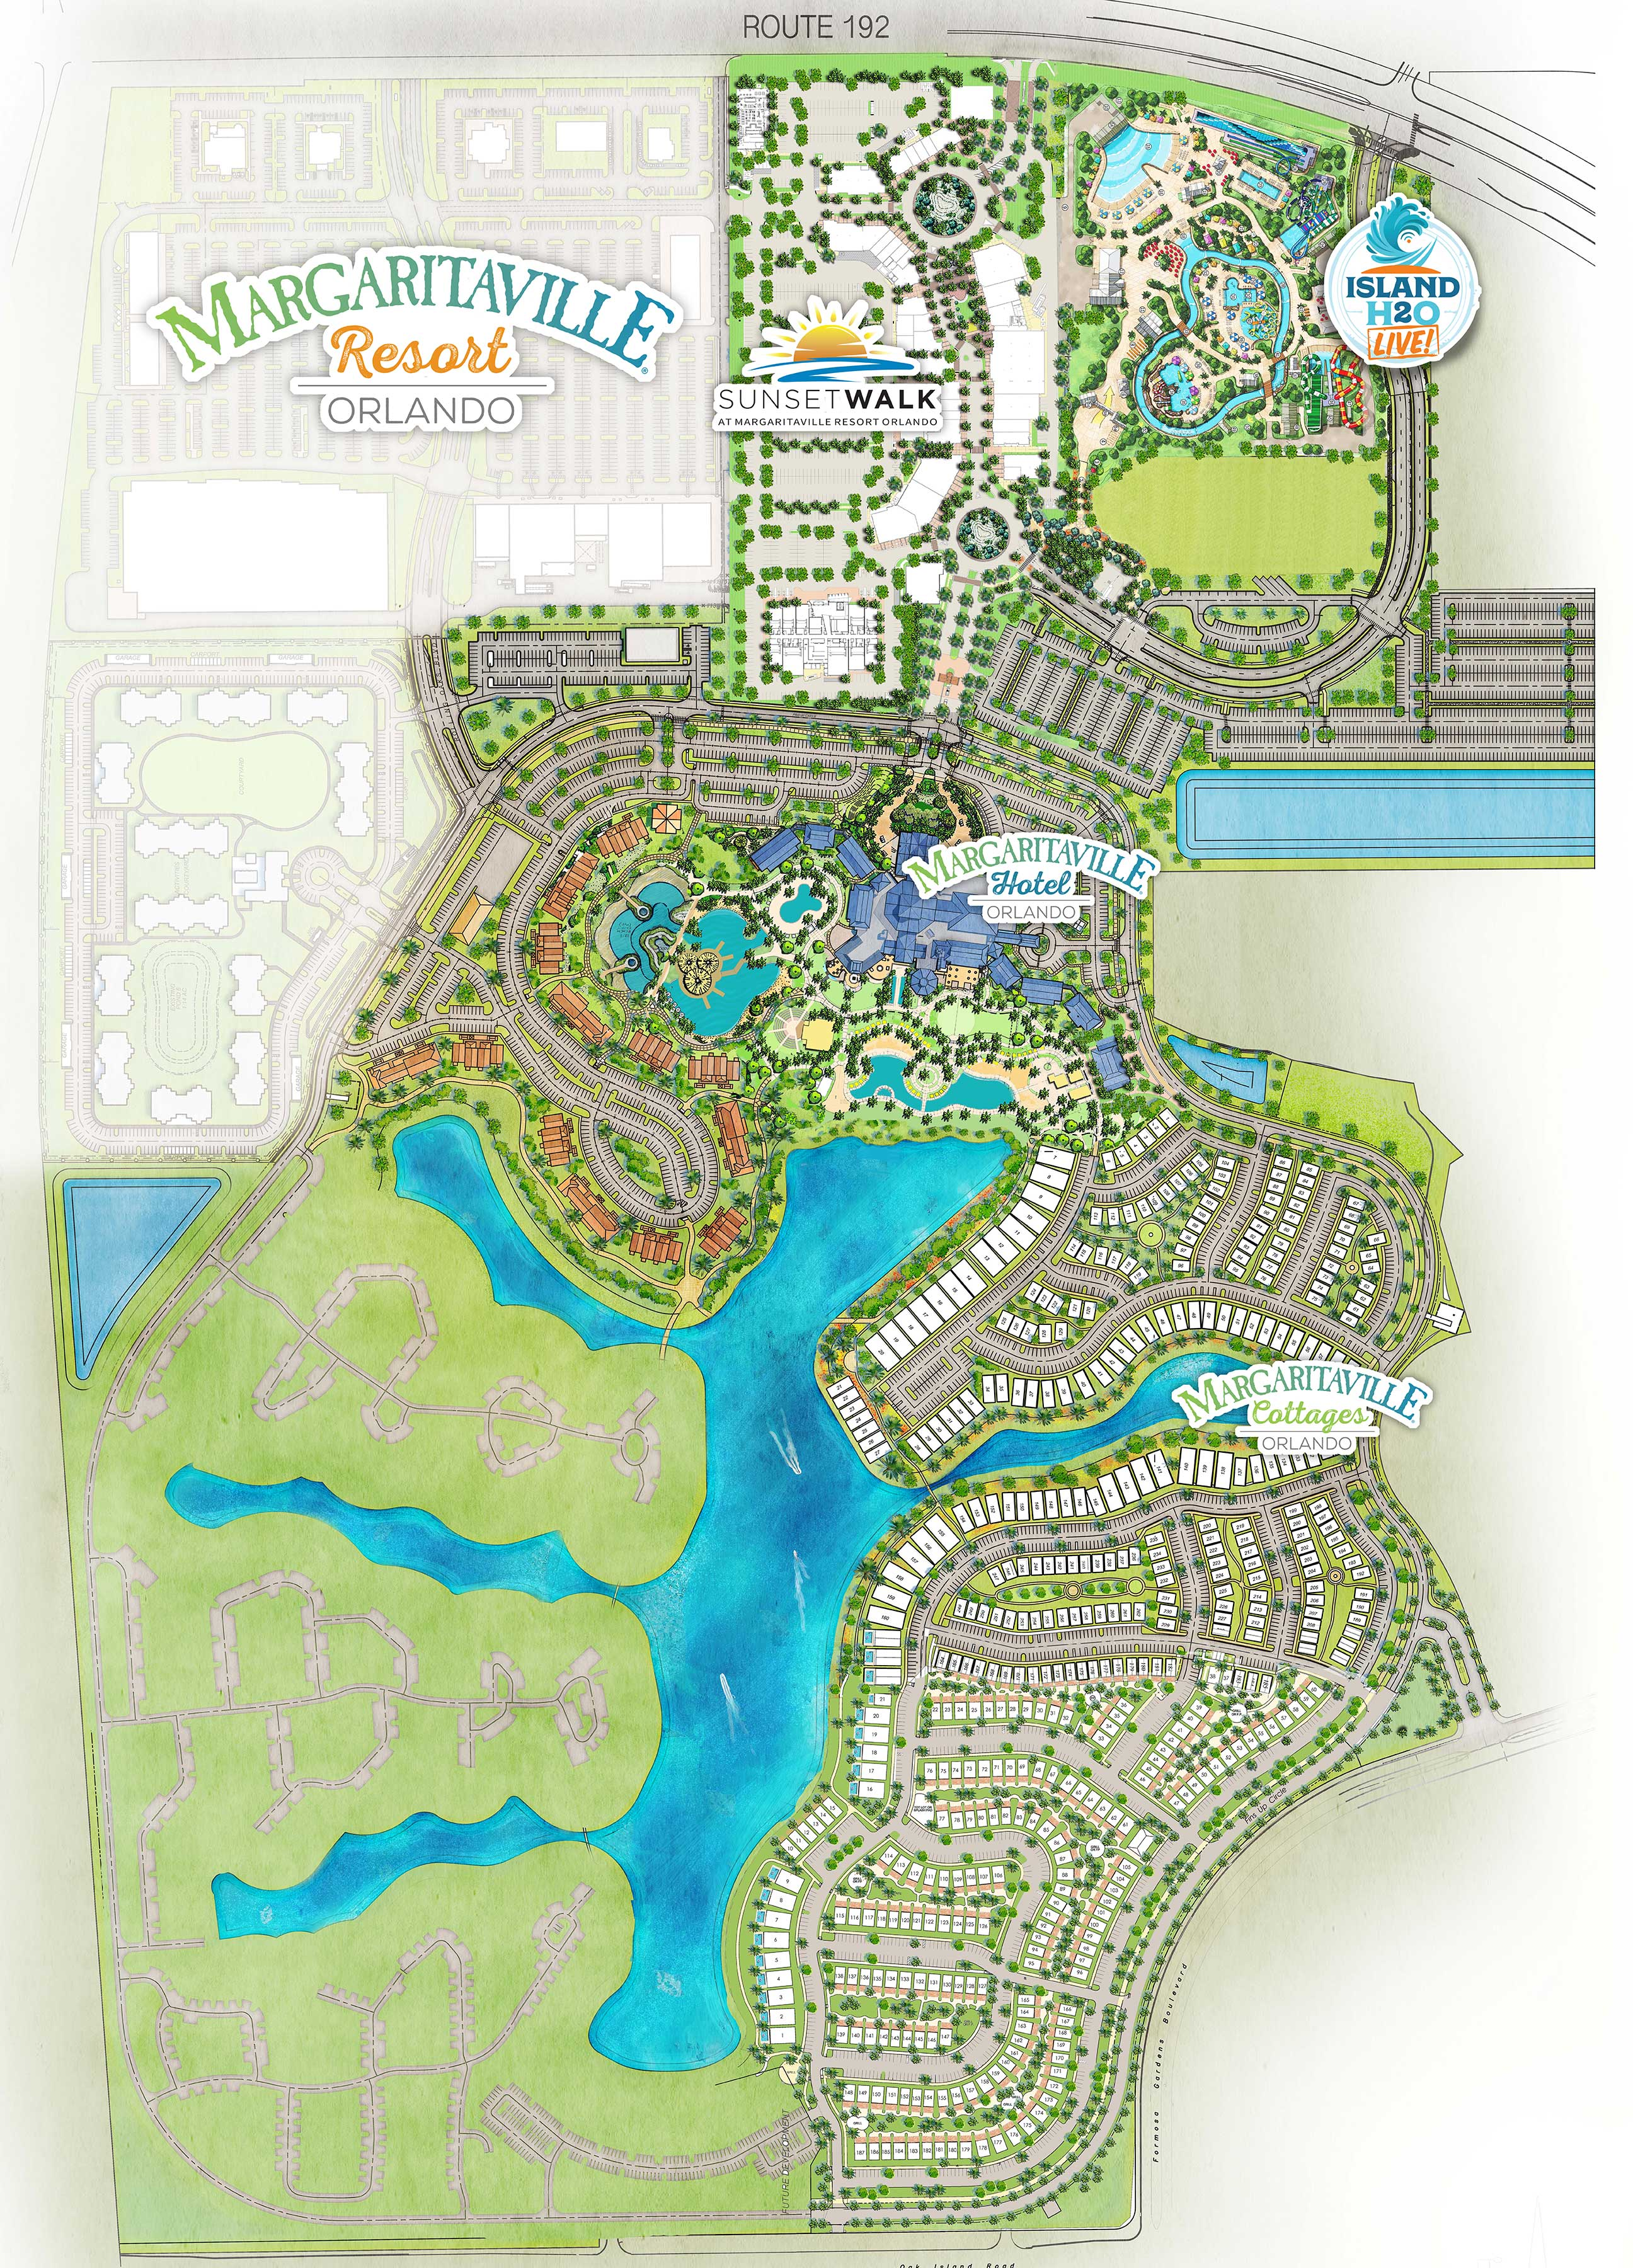 Margaritaville Resort Orlando site map